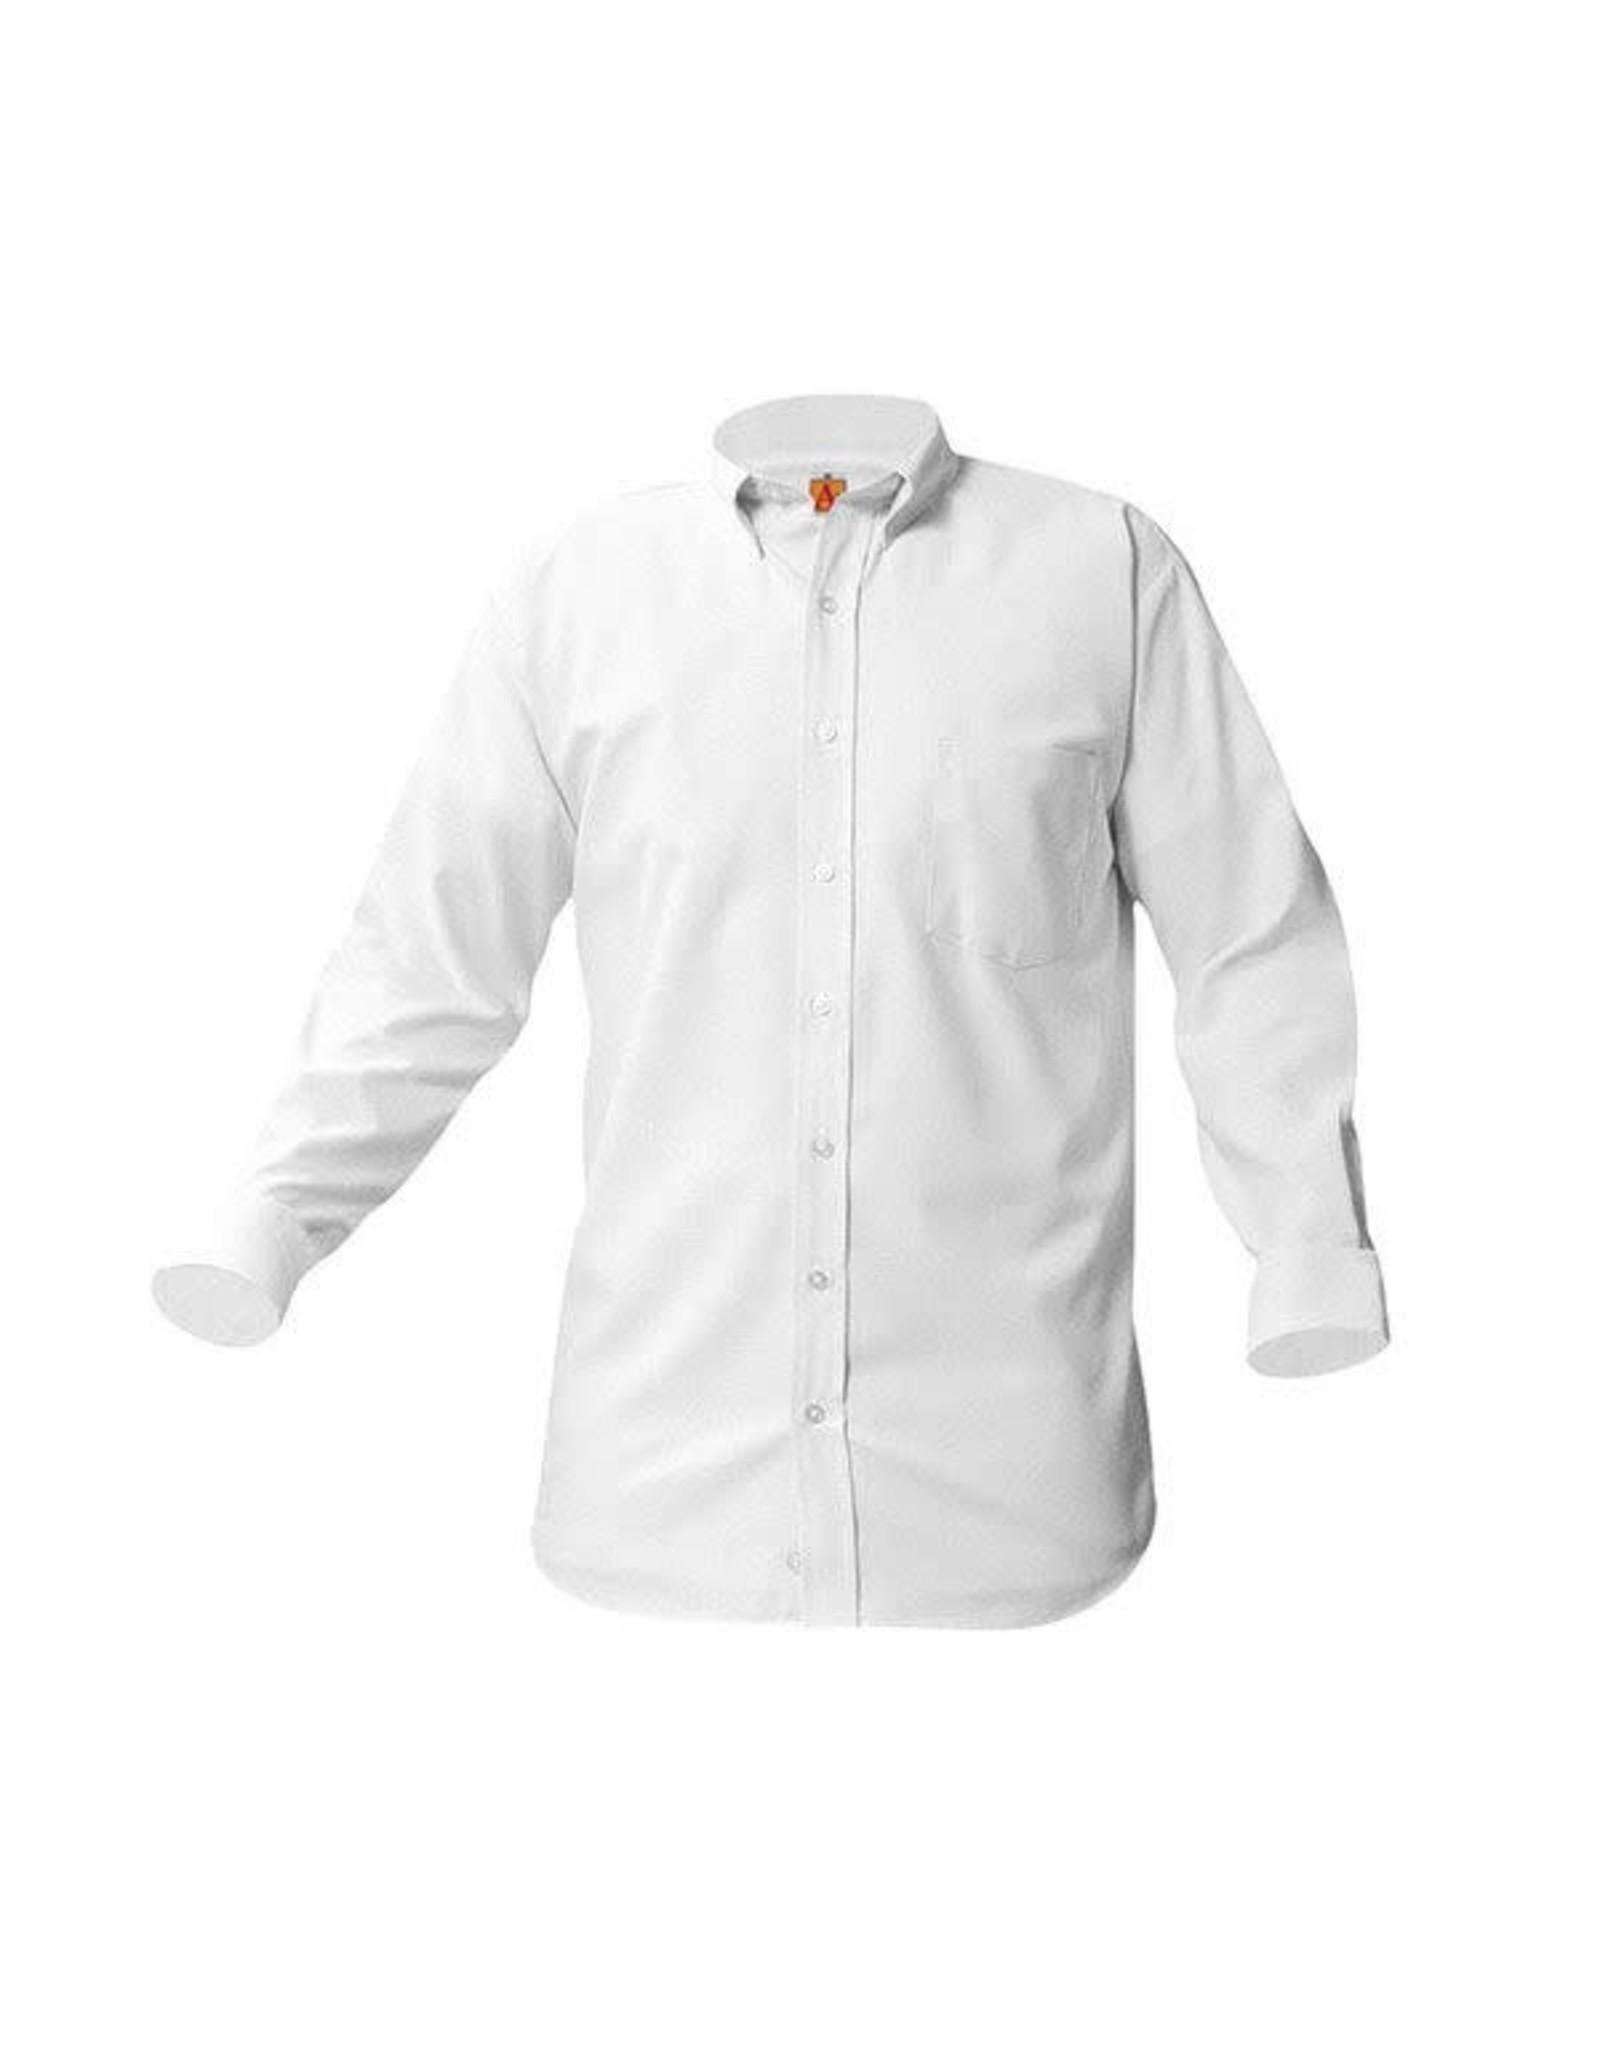 UNIFORM Boys Oxford Long Sleeve, White